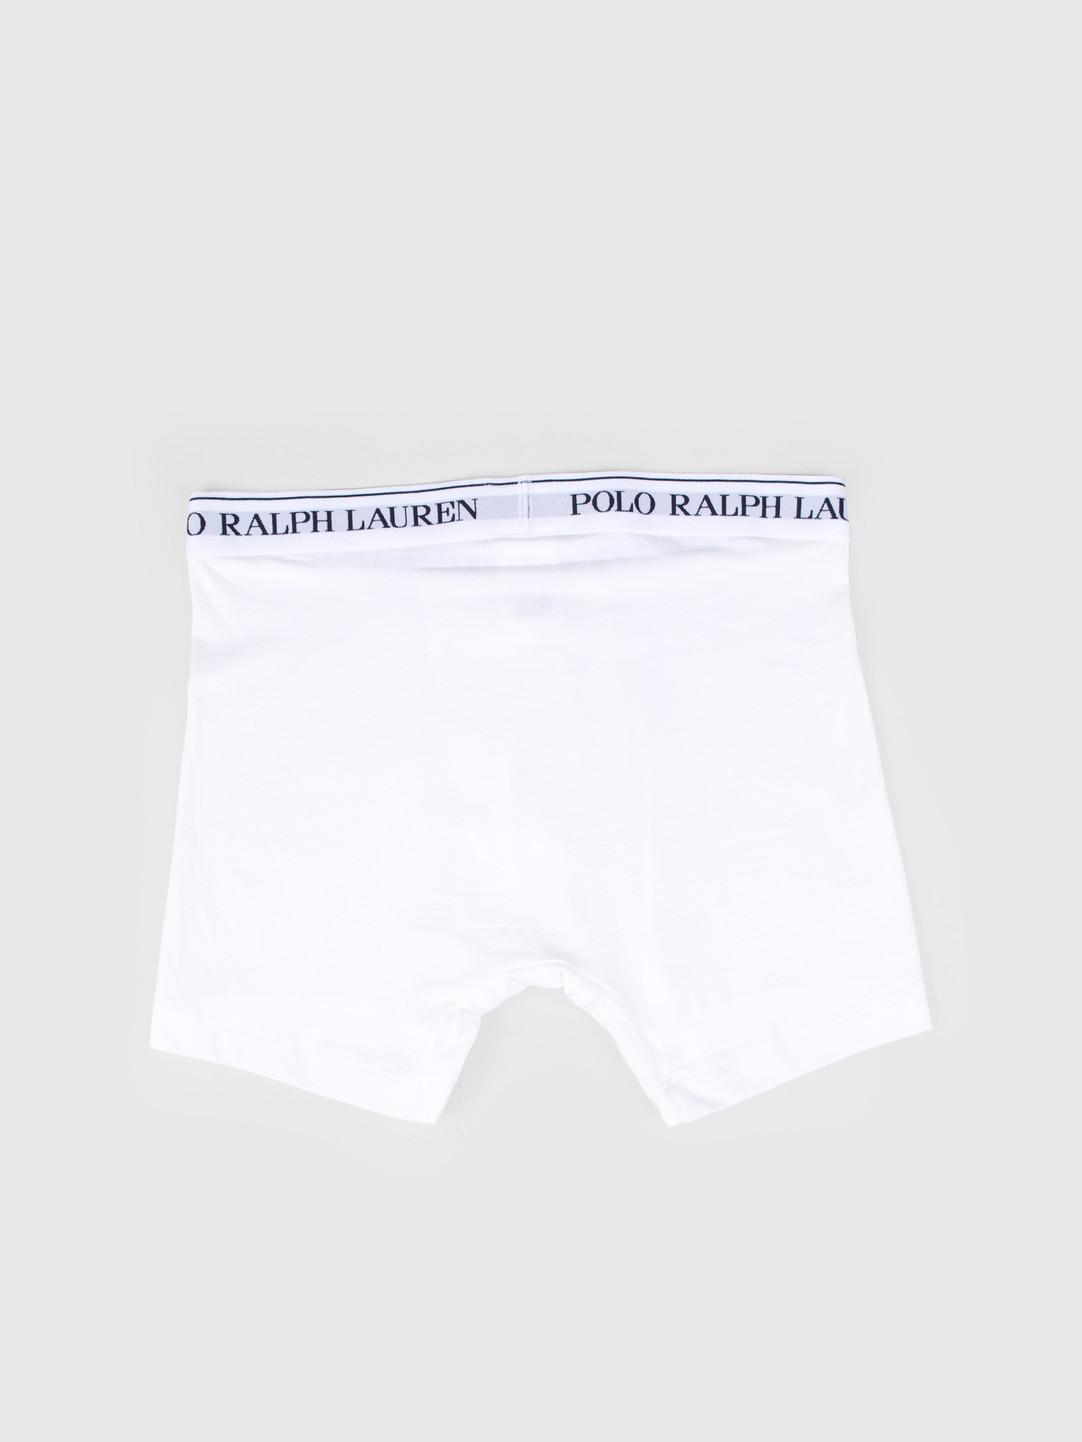 Polo Ralph Lauren Polo Ralph Lauren 3 Pack Boxer Brief White 714621874004